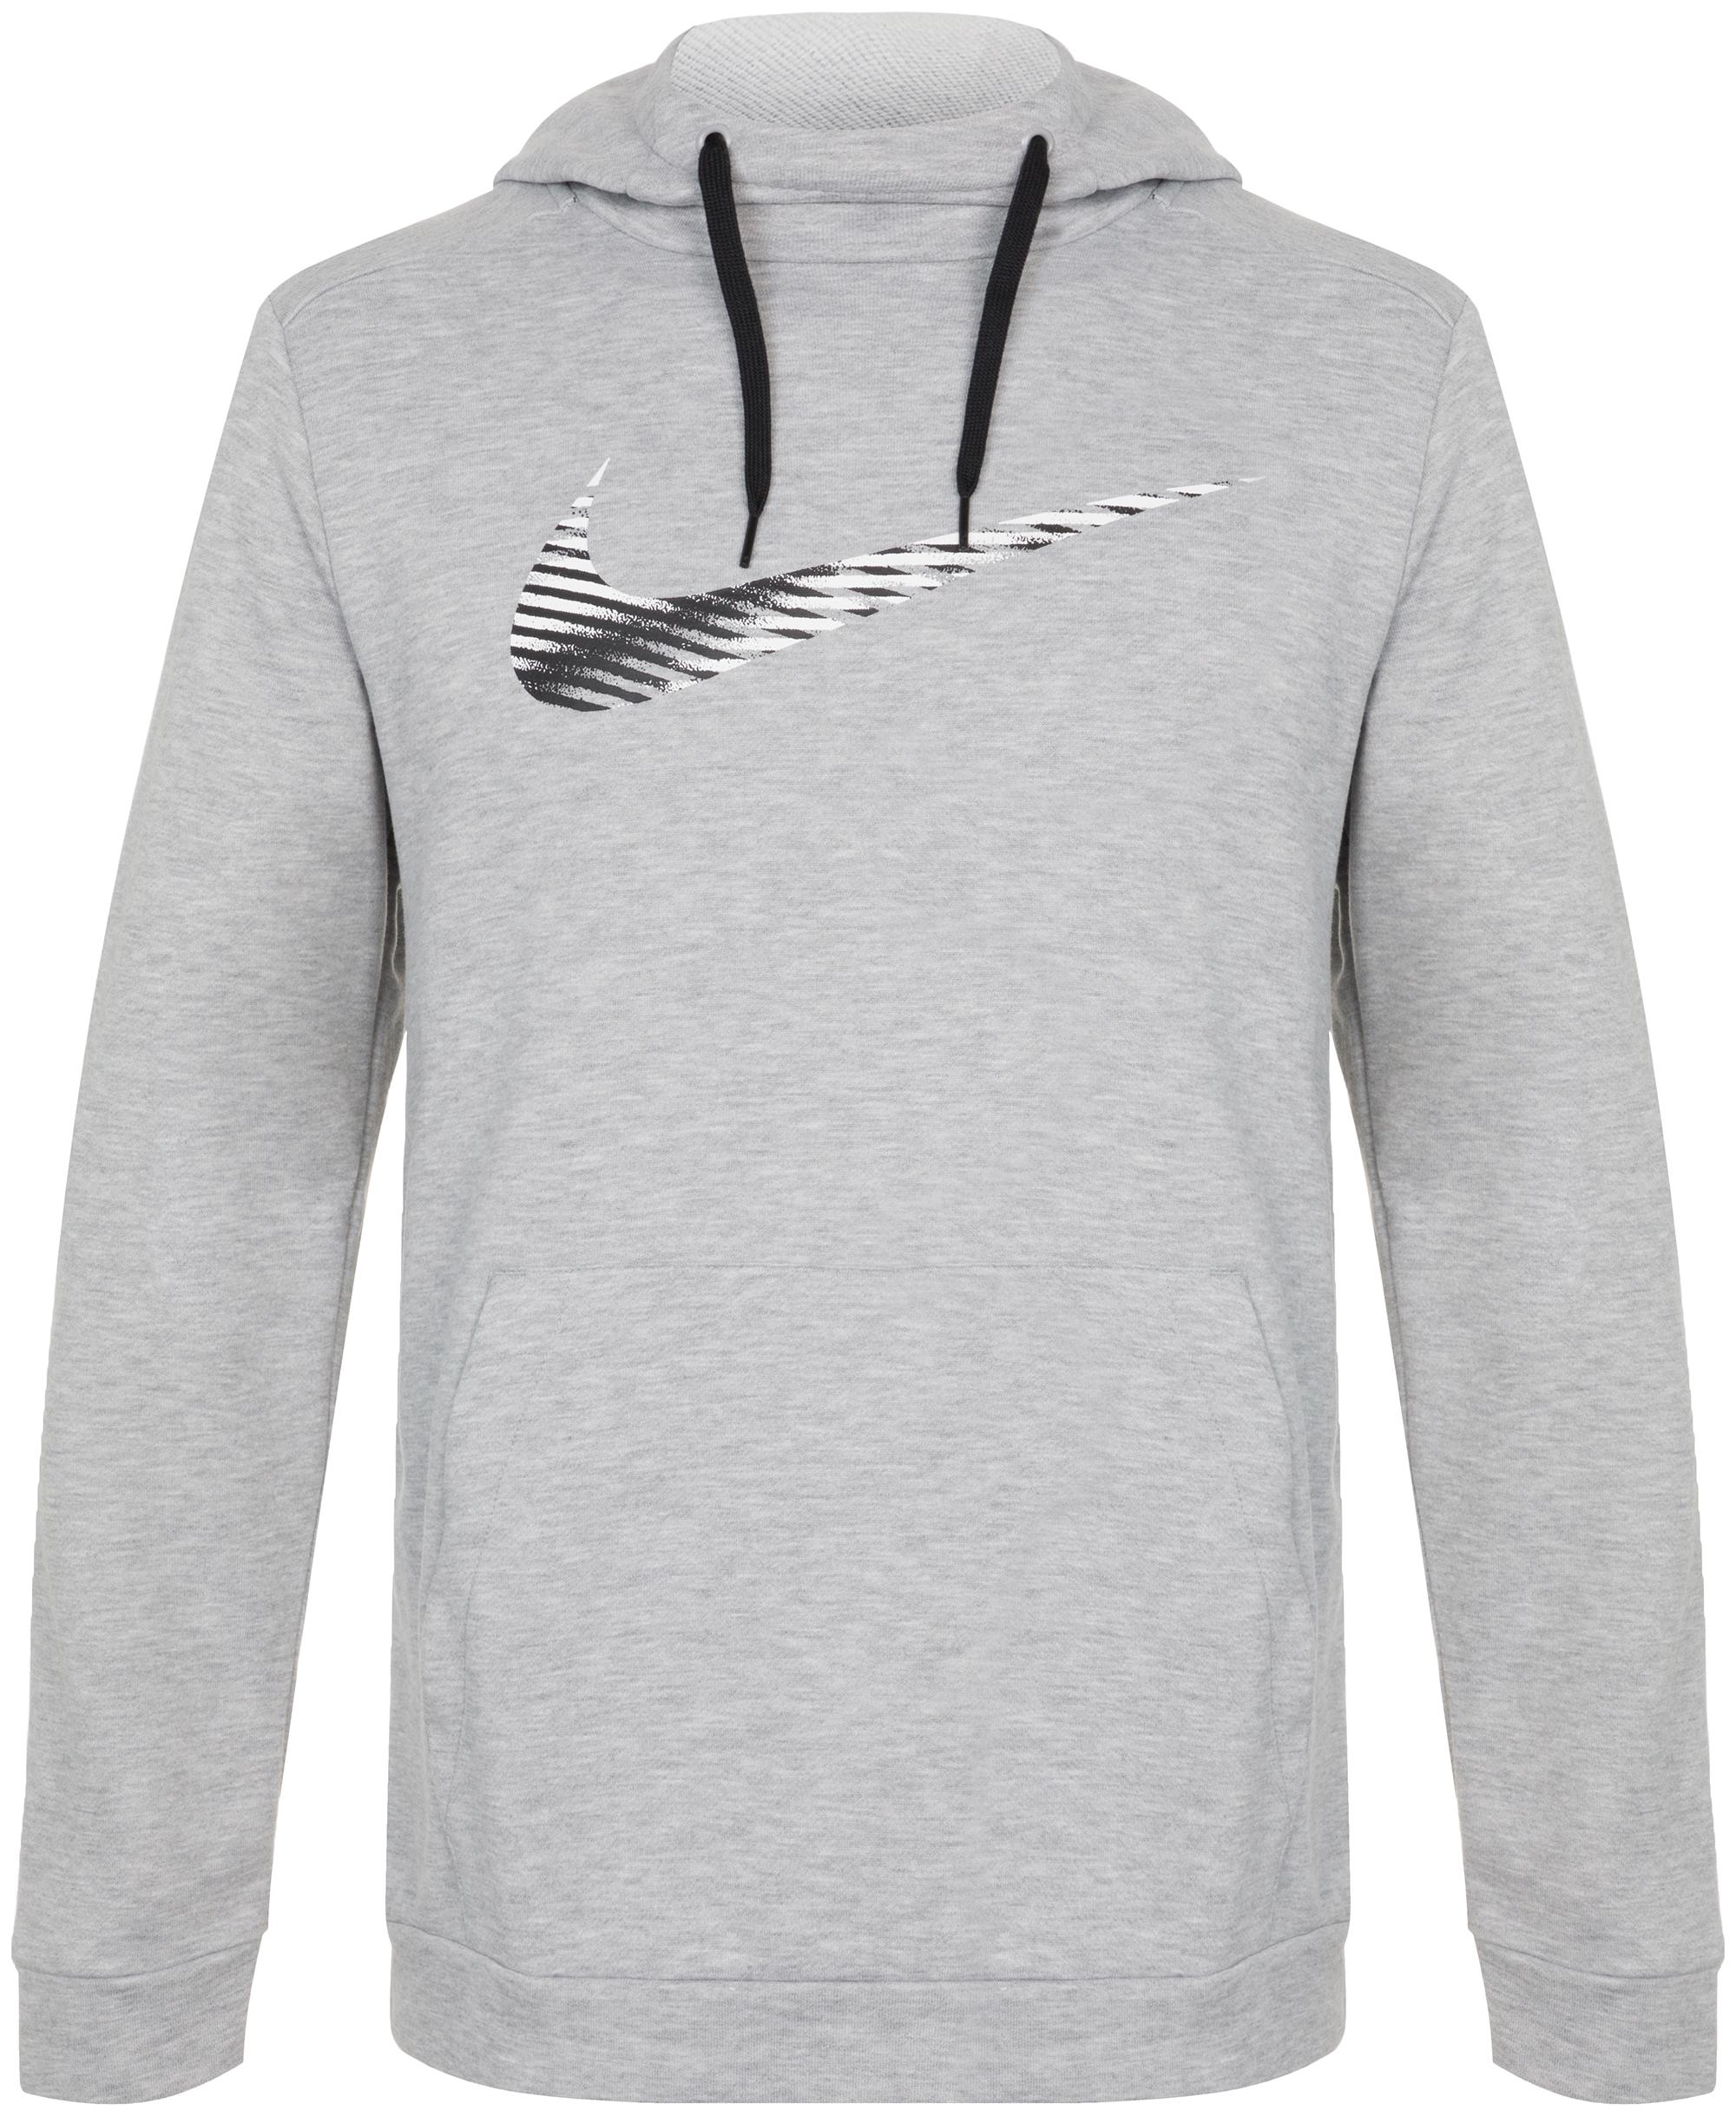 Nike Худи мужская Nike Dri-FIT, размер 52-54 худи superdry оранжевый 54 размер